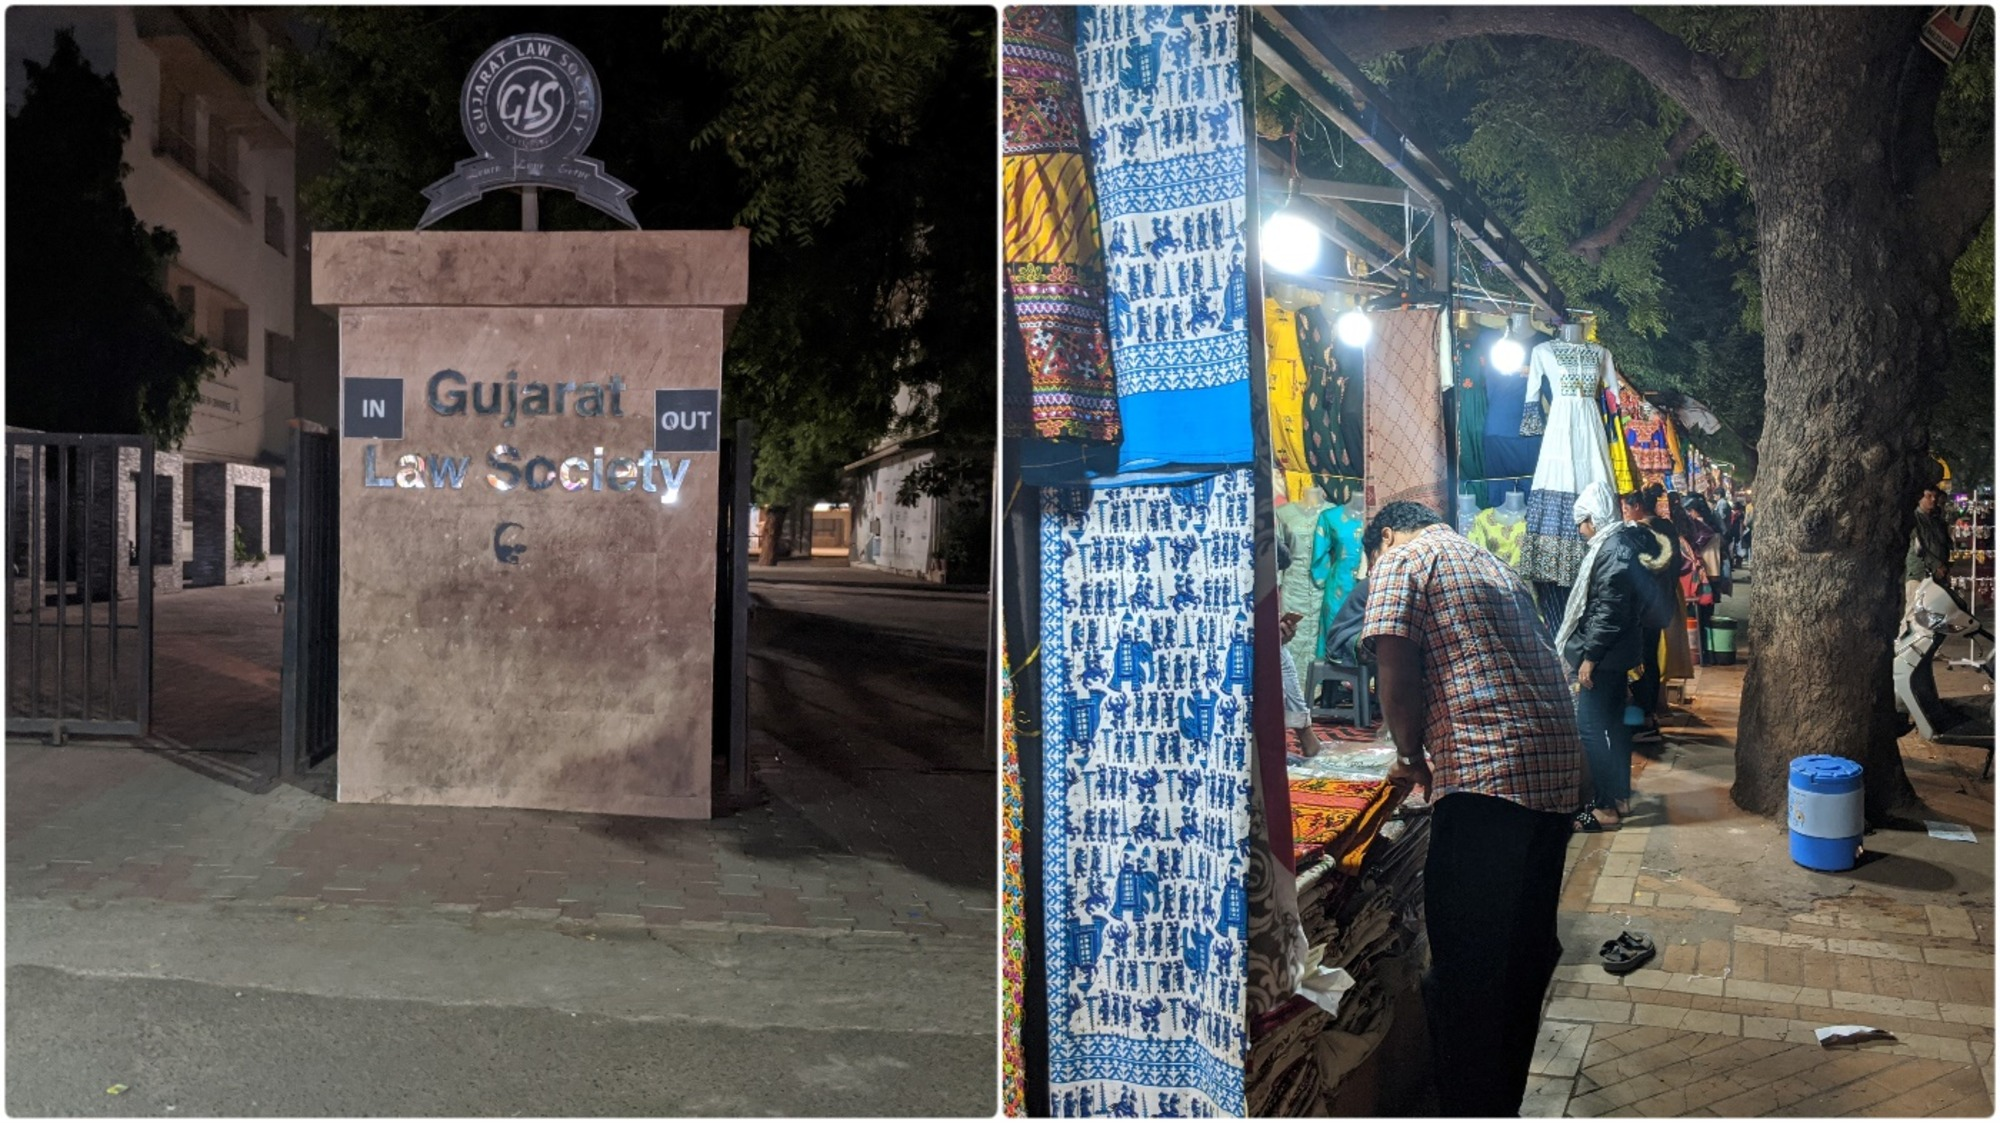 Law Garden, Ahmedabad, Gujarat